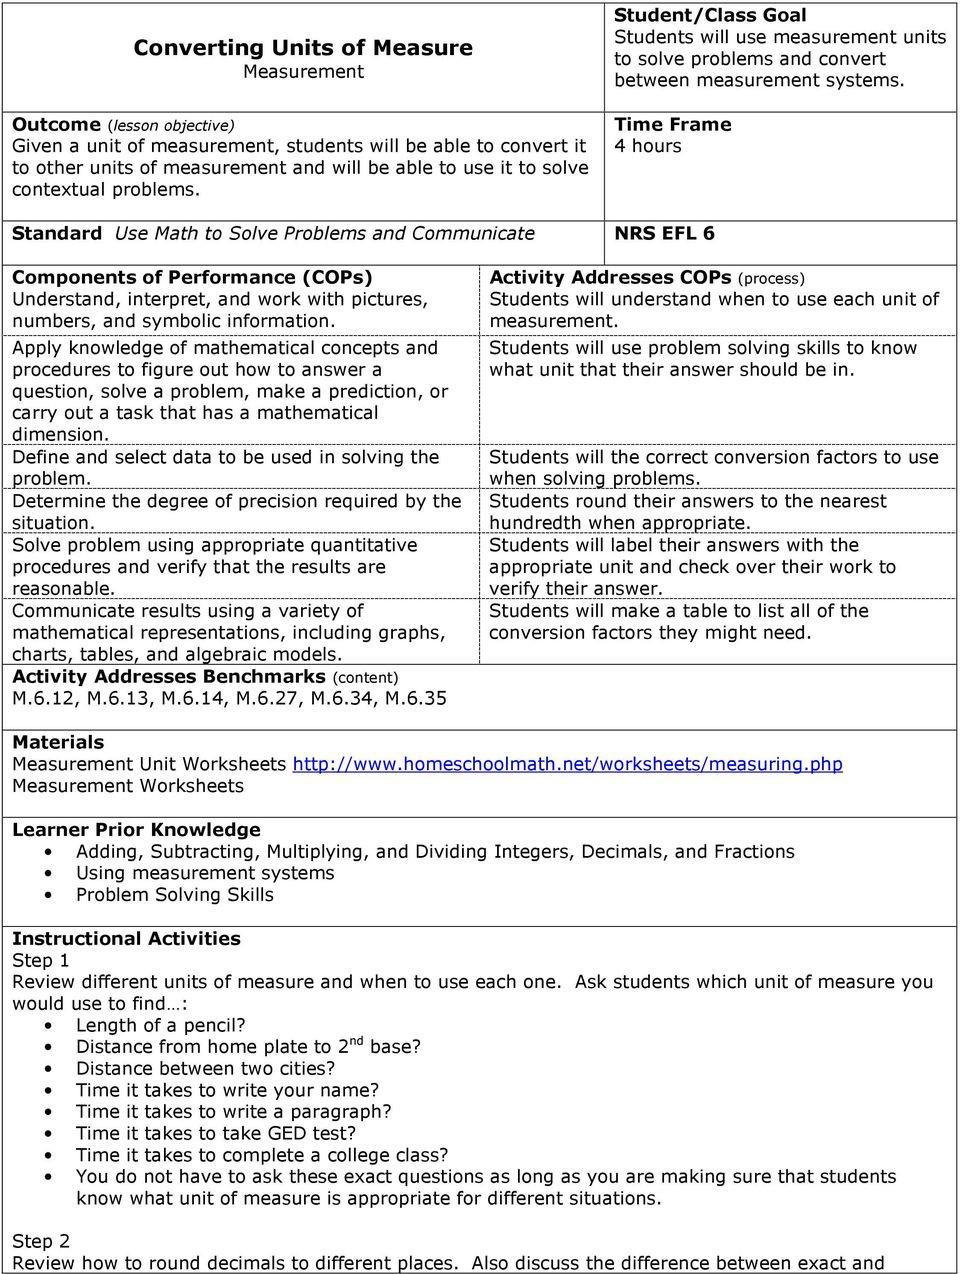 Unit Conversion Worksheet Pdf